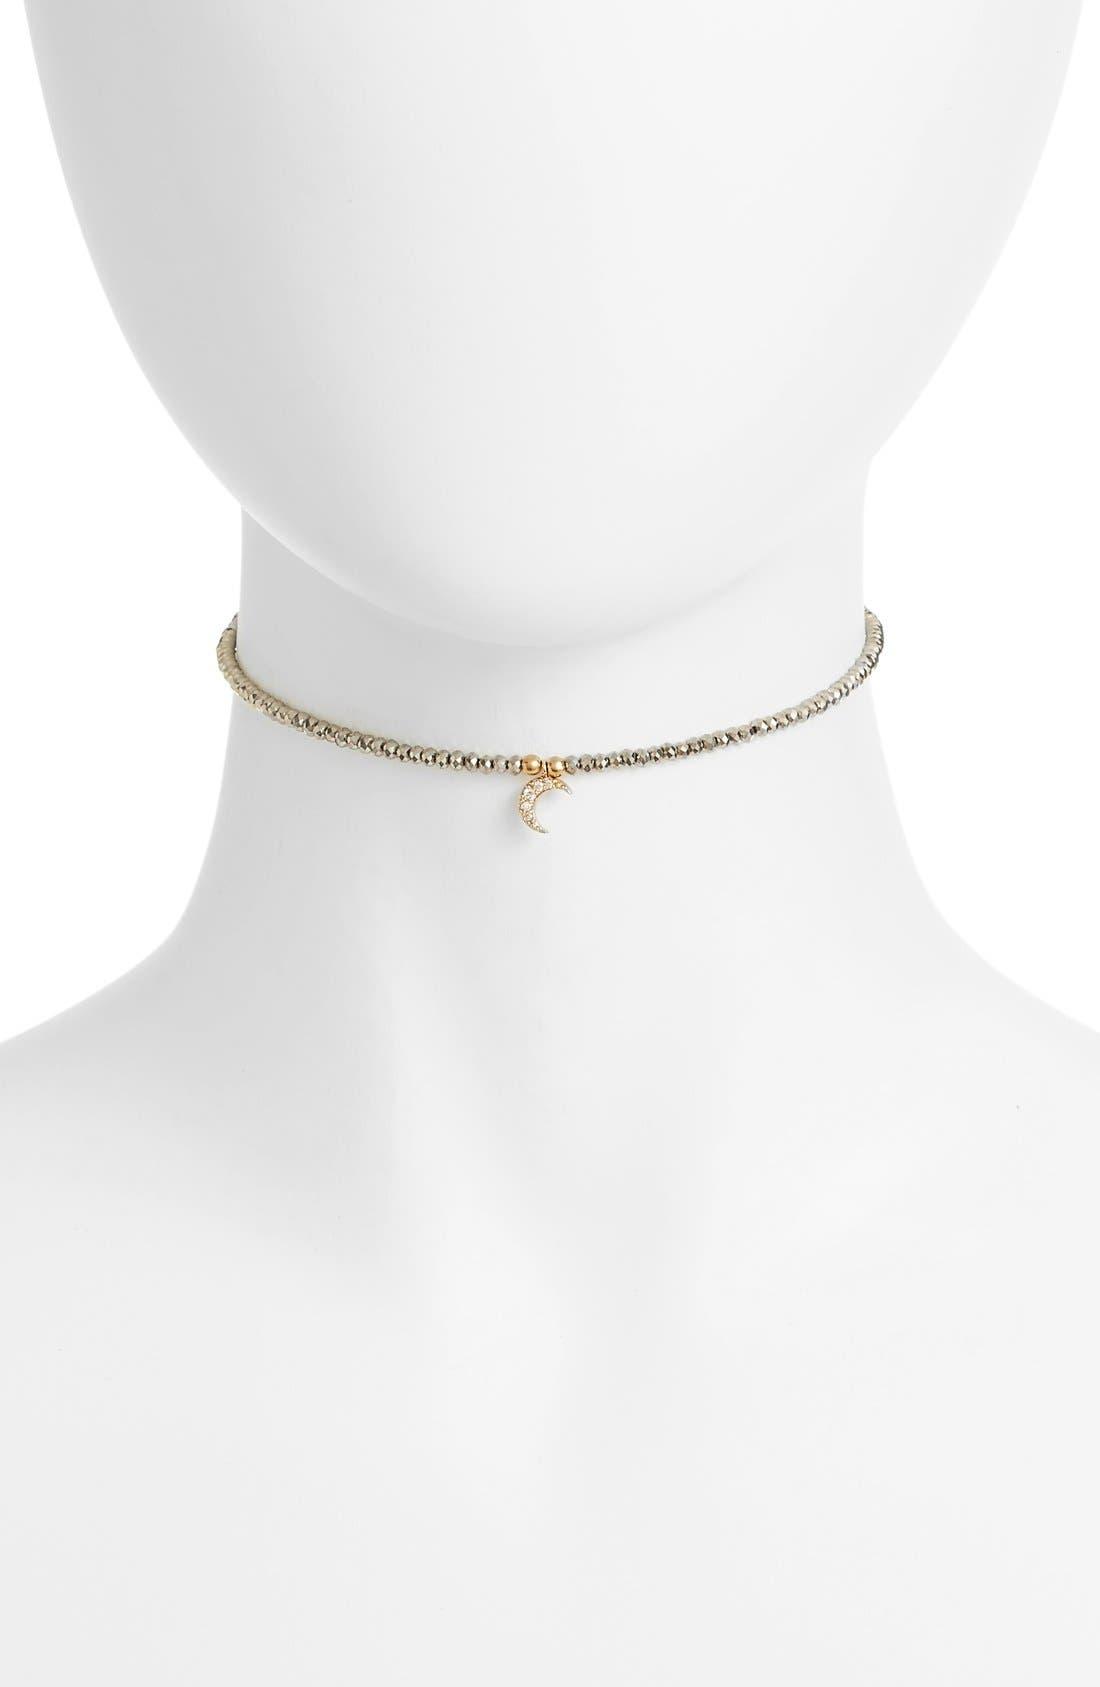 Selene Choker,                         Main,                         color, Gold/ Hematite/ Clear